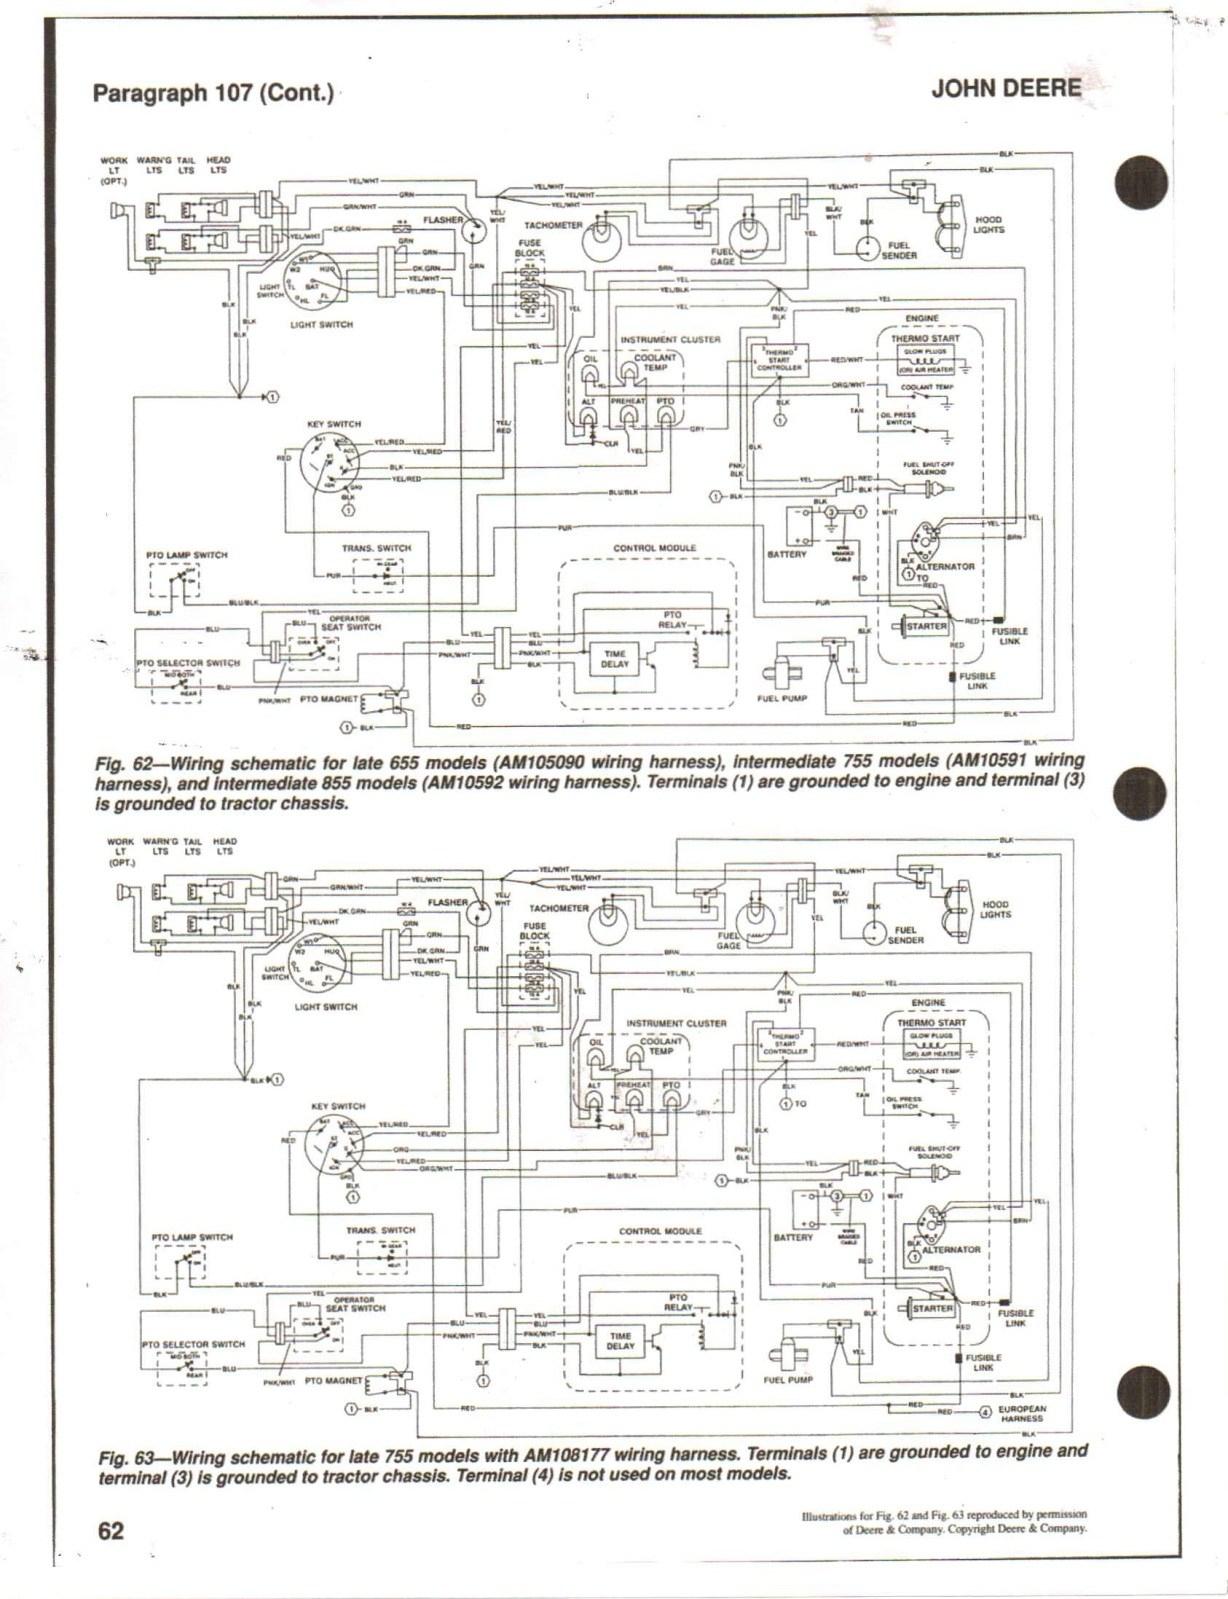 Wire Diagram For Kubota B7800 | Wiring Library - Kubota B7800 Wiring Diagram